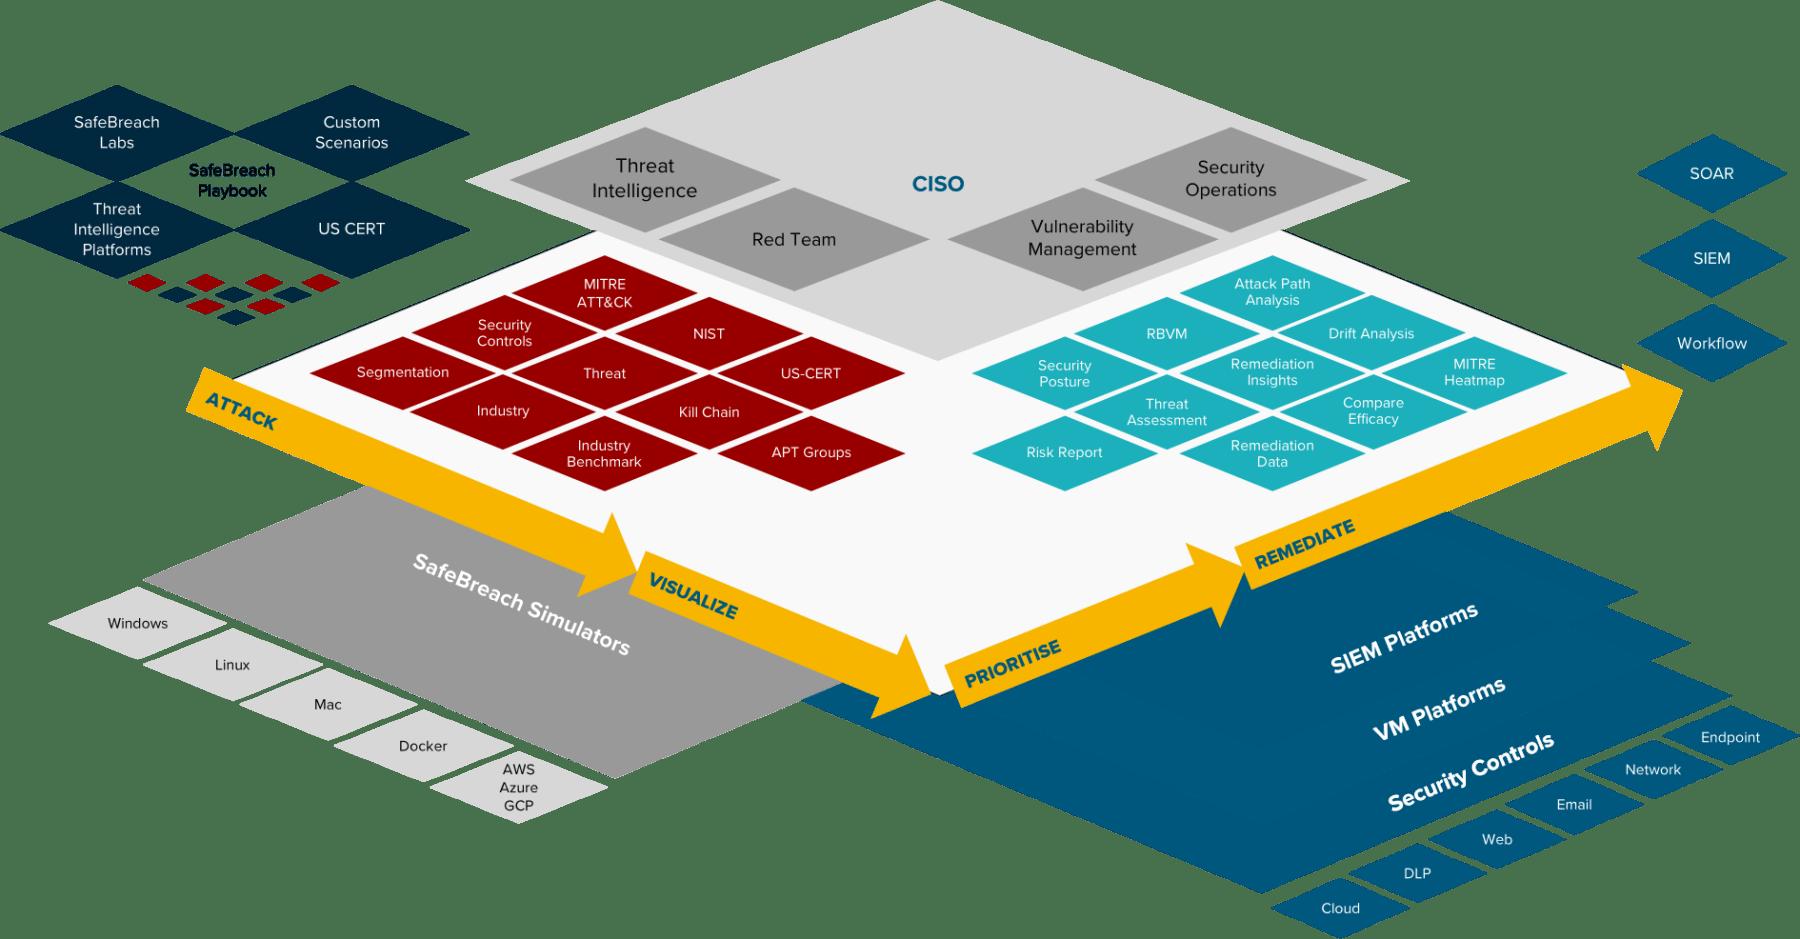 SafeBreach Platform